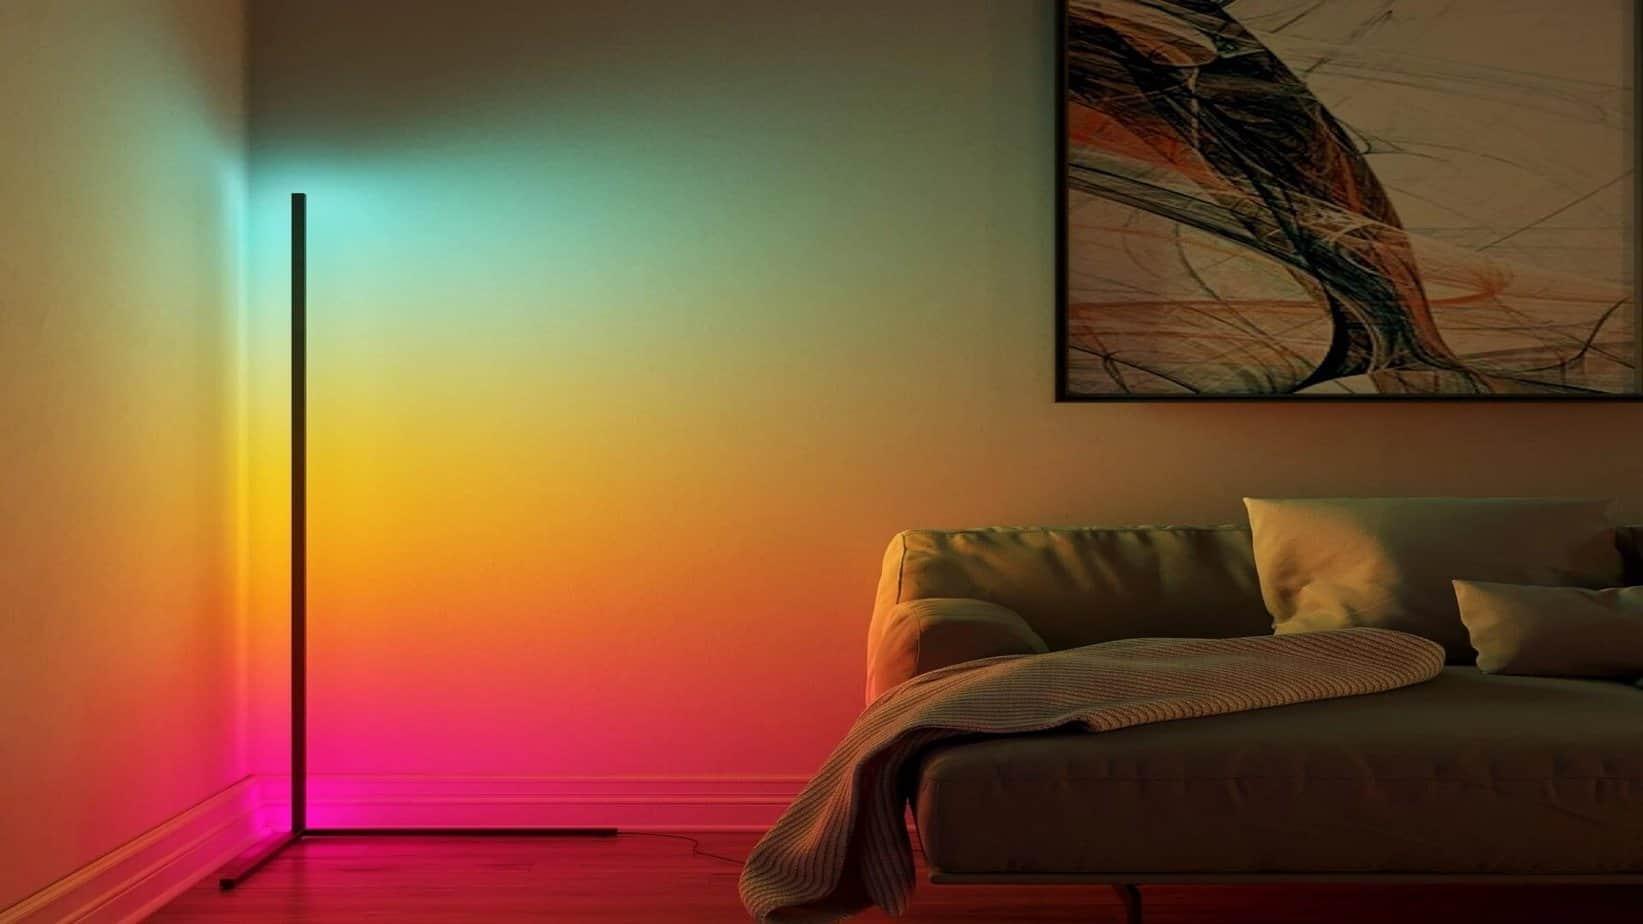 Designer LED Lamp to Improve Mental Health